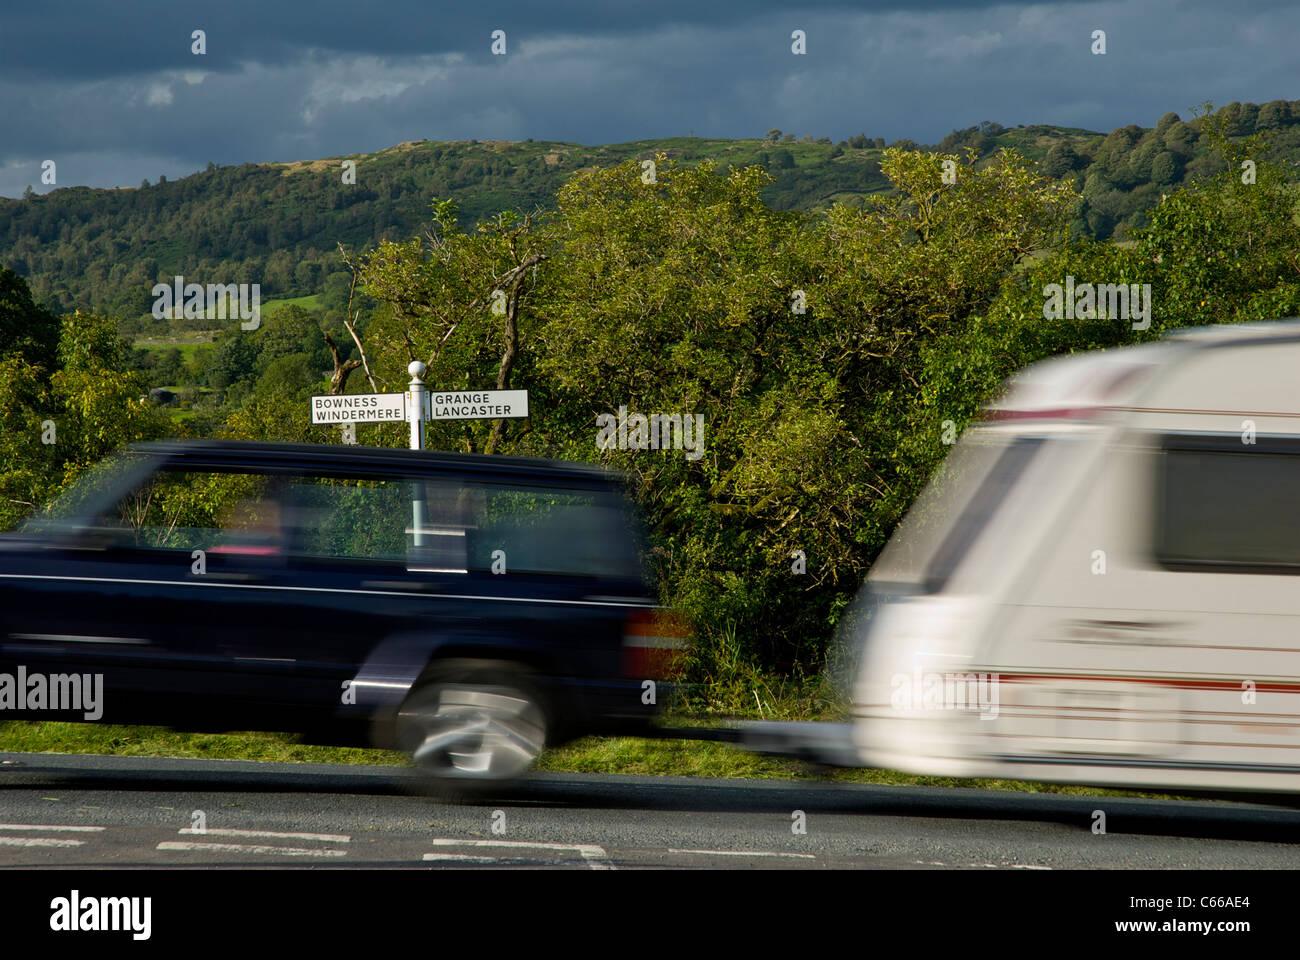 Lakeland Land Rover >> Car Towing Caravan Stock Photos & Car Towing Caravan Stock ...